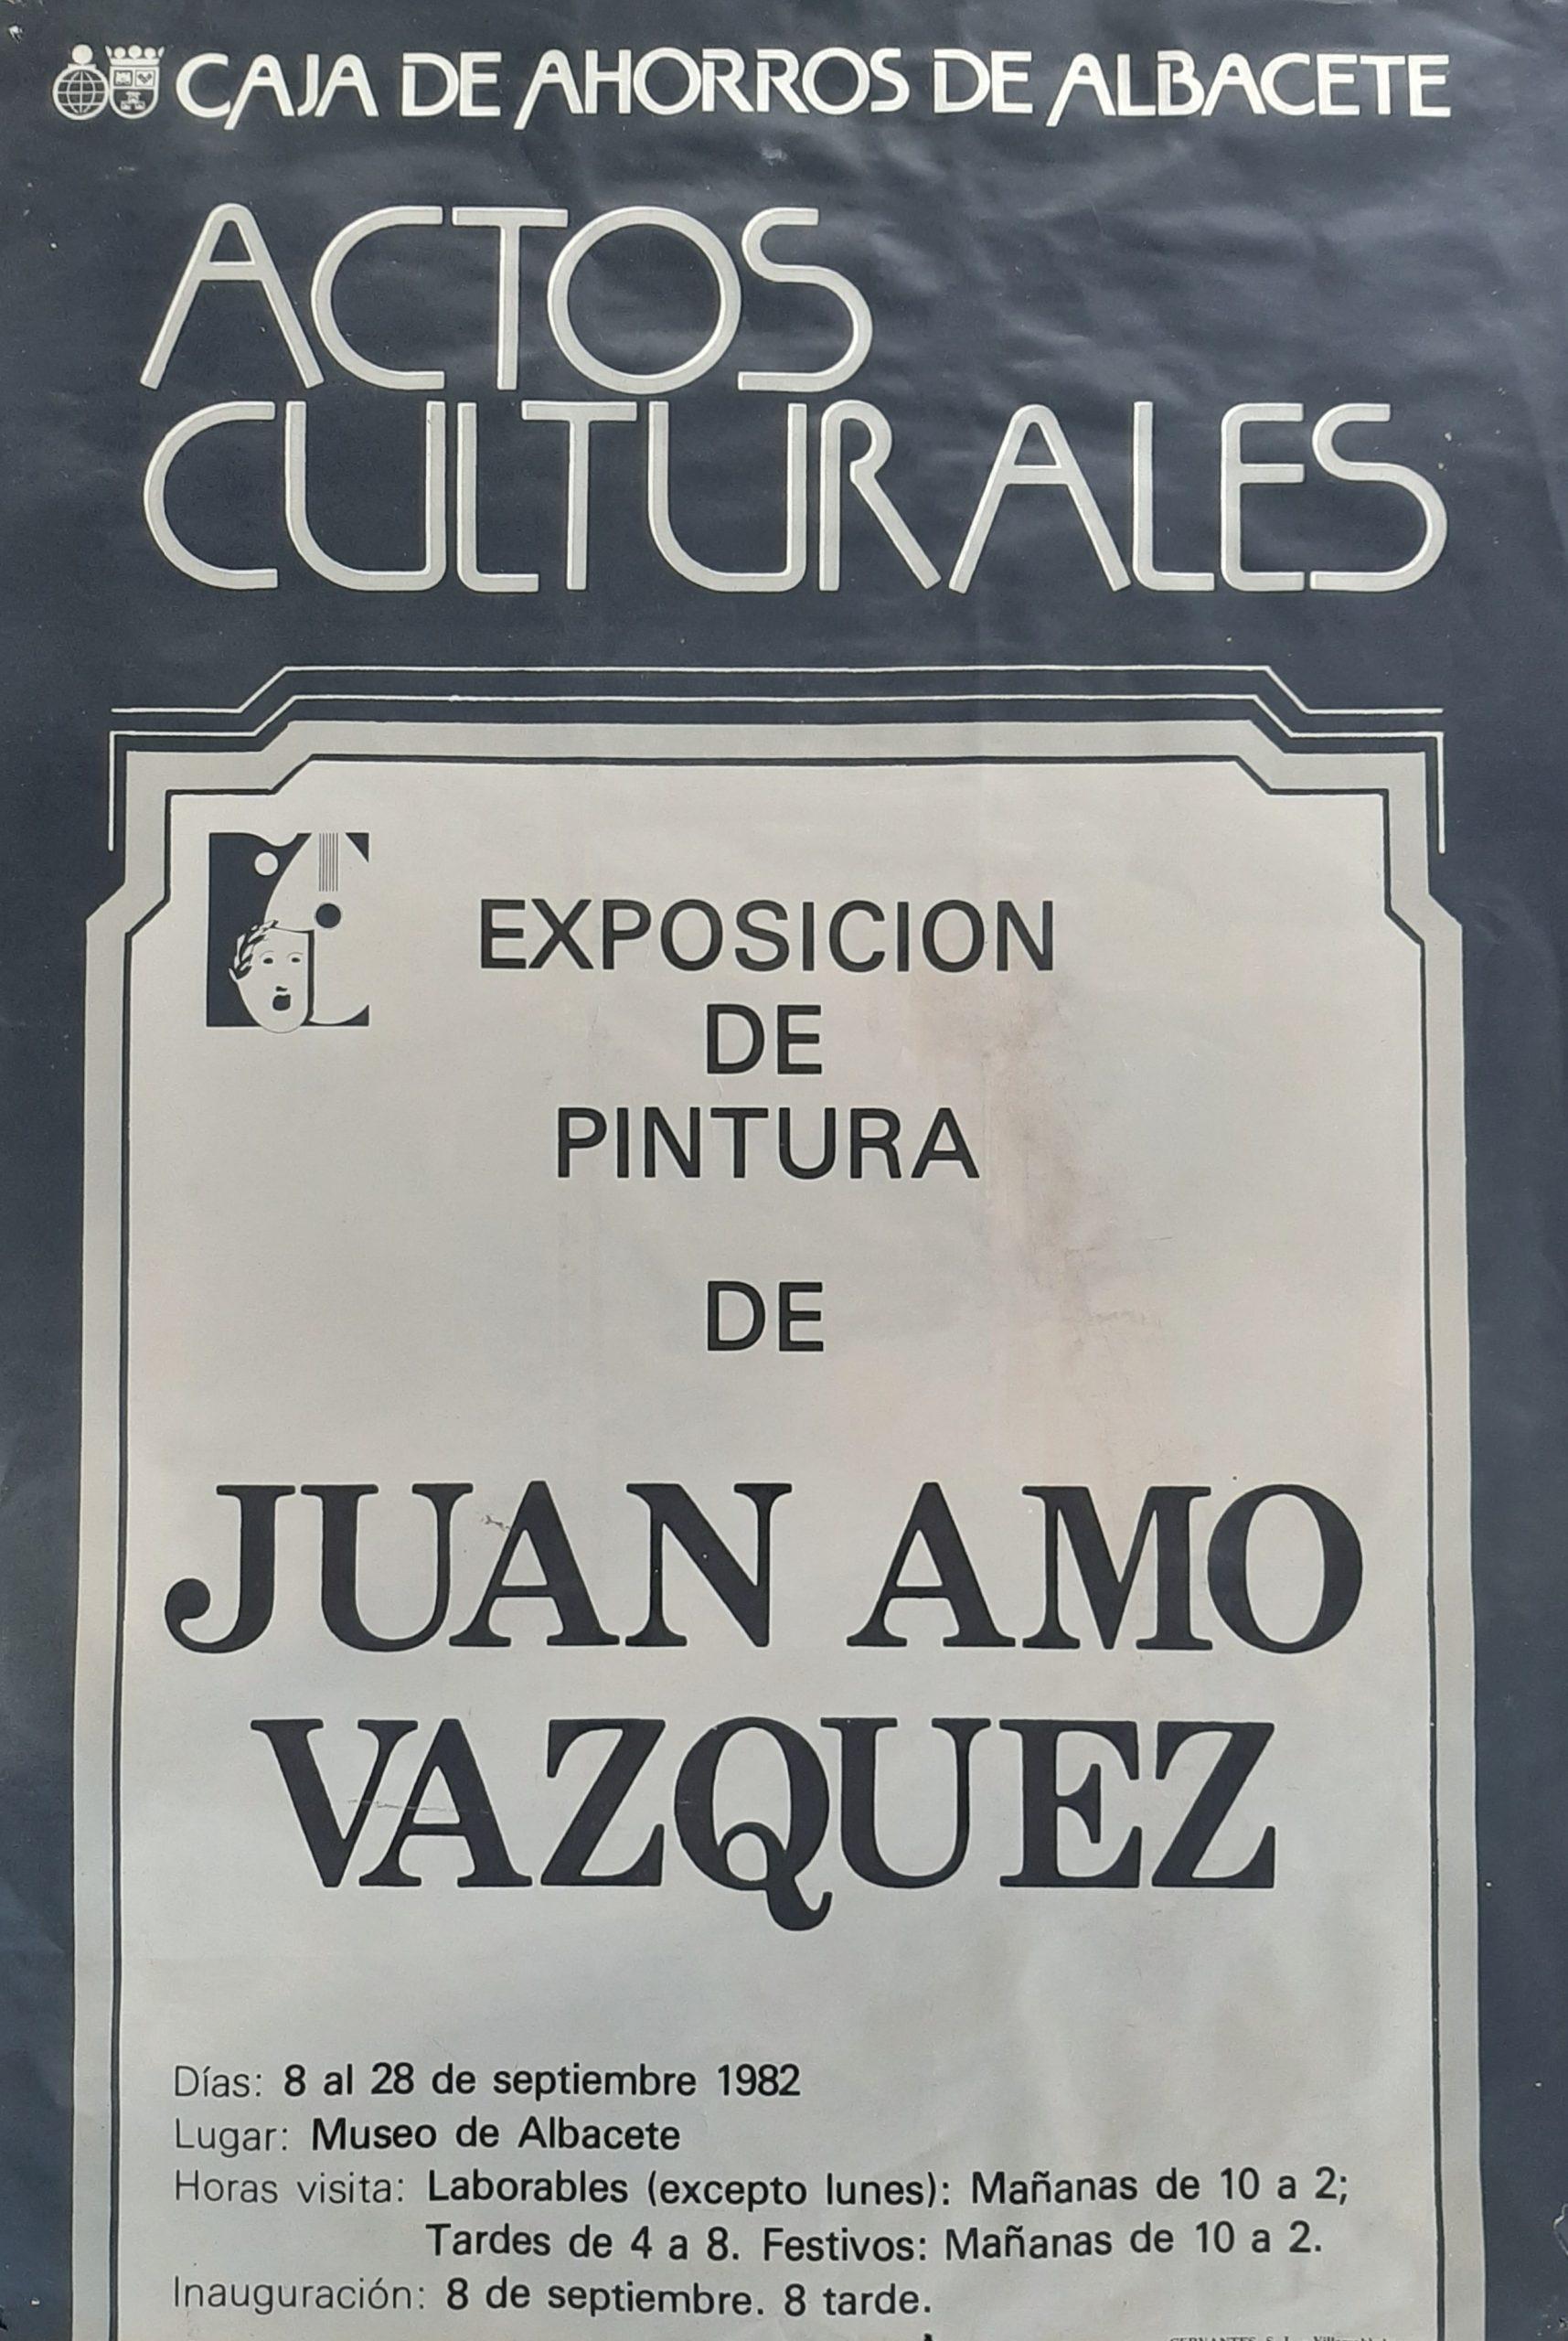 Exposición de Juan Amo Vázquez (1982). Museo de Albacete.